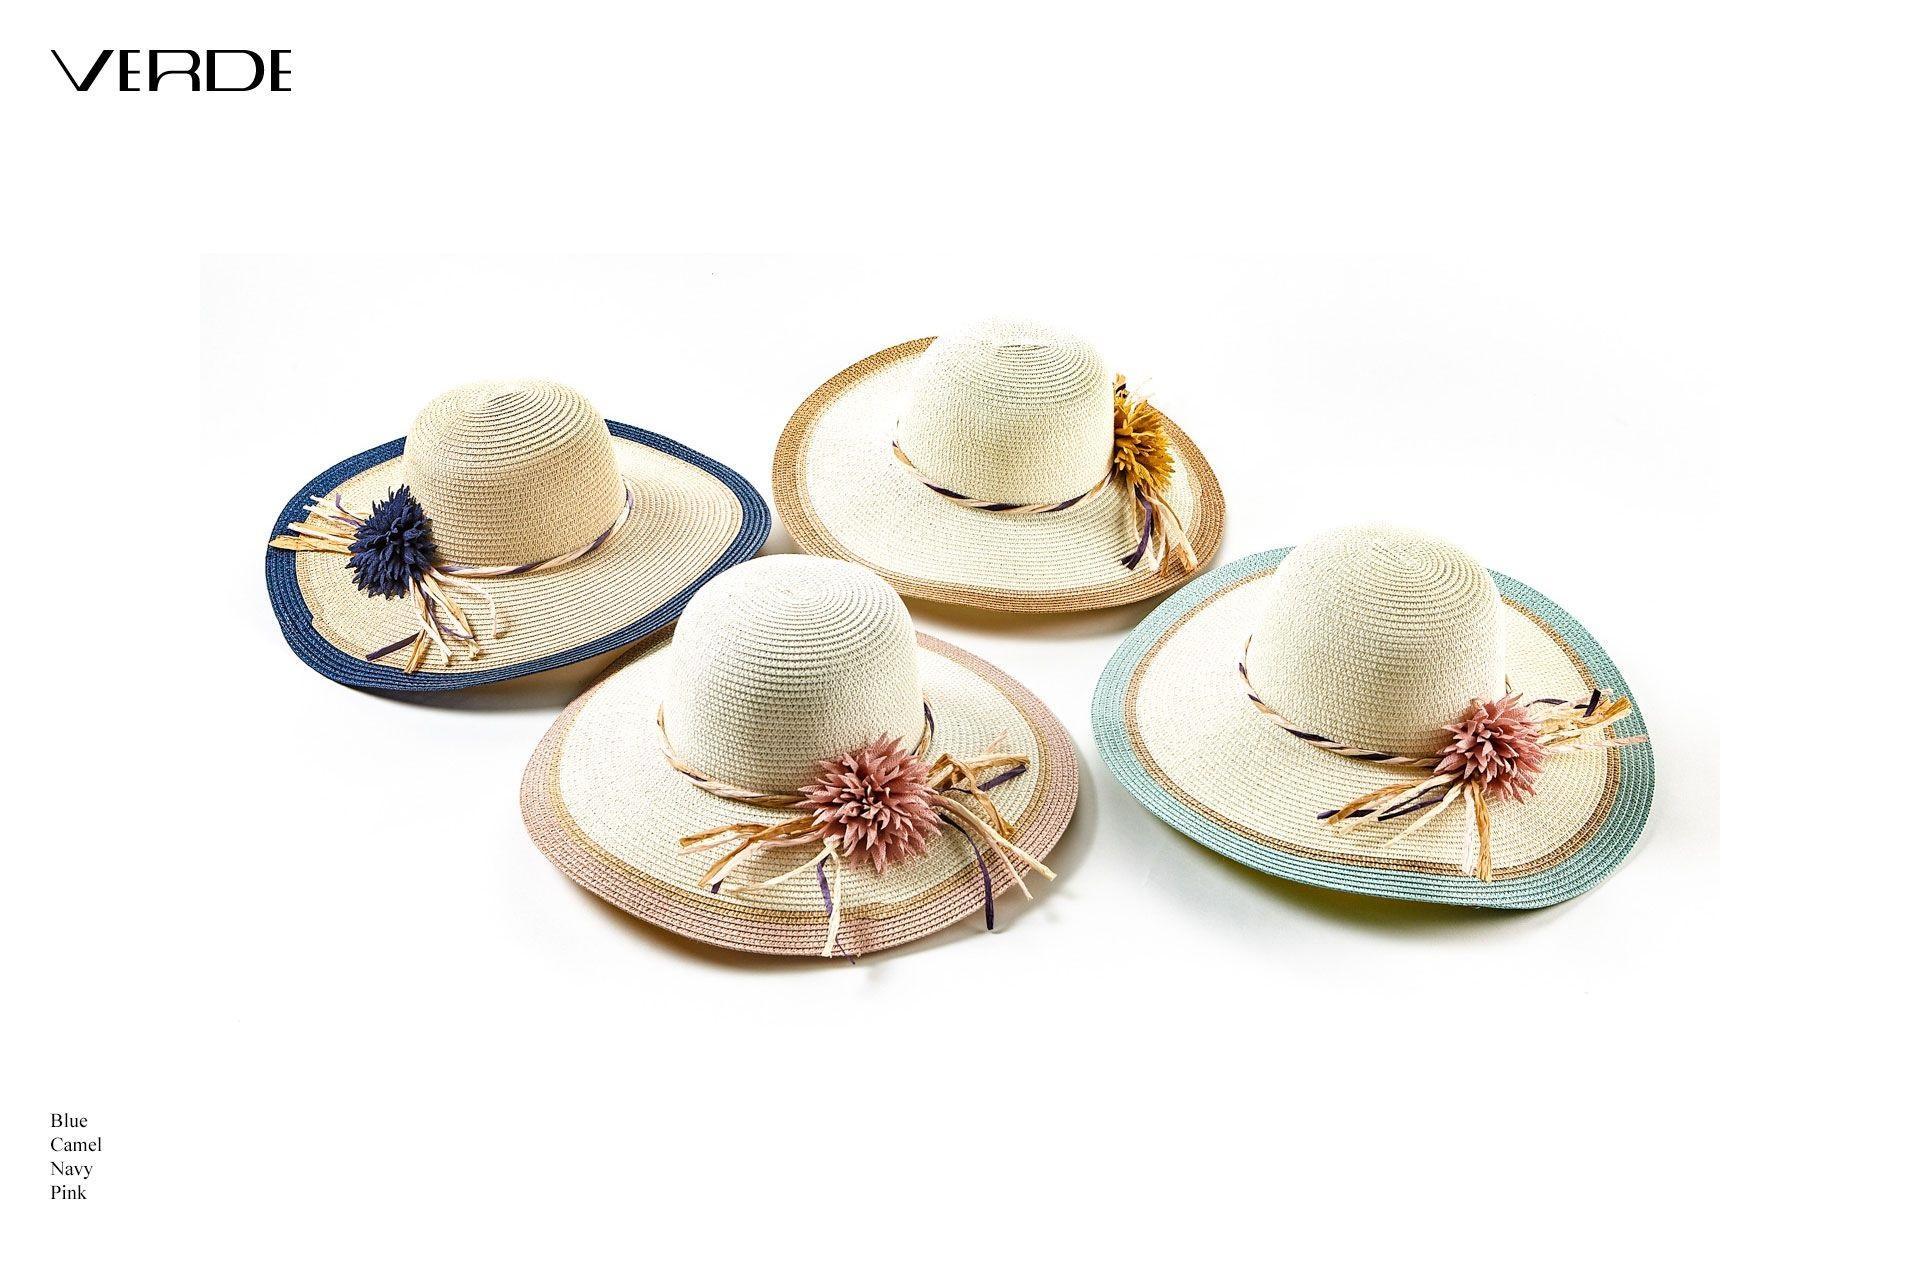 Straw hats for women. Online hat shop